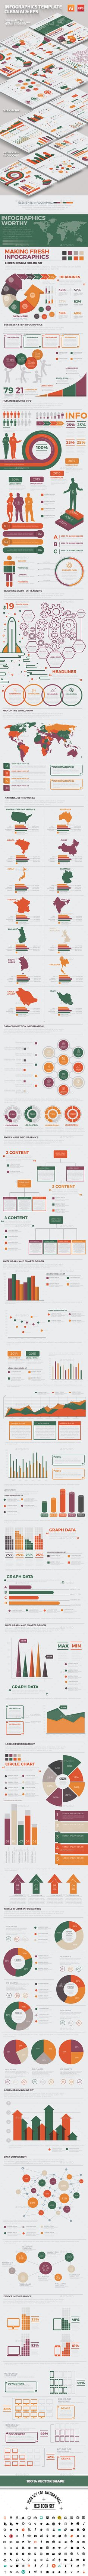 Big Infographics Template Design - Infographics